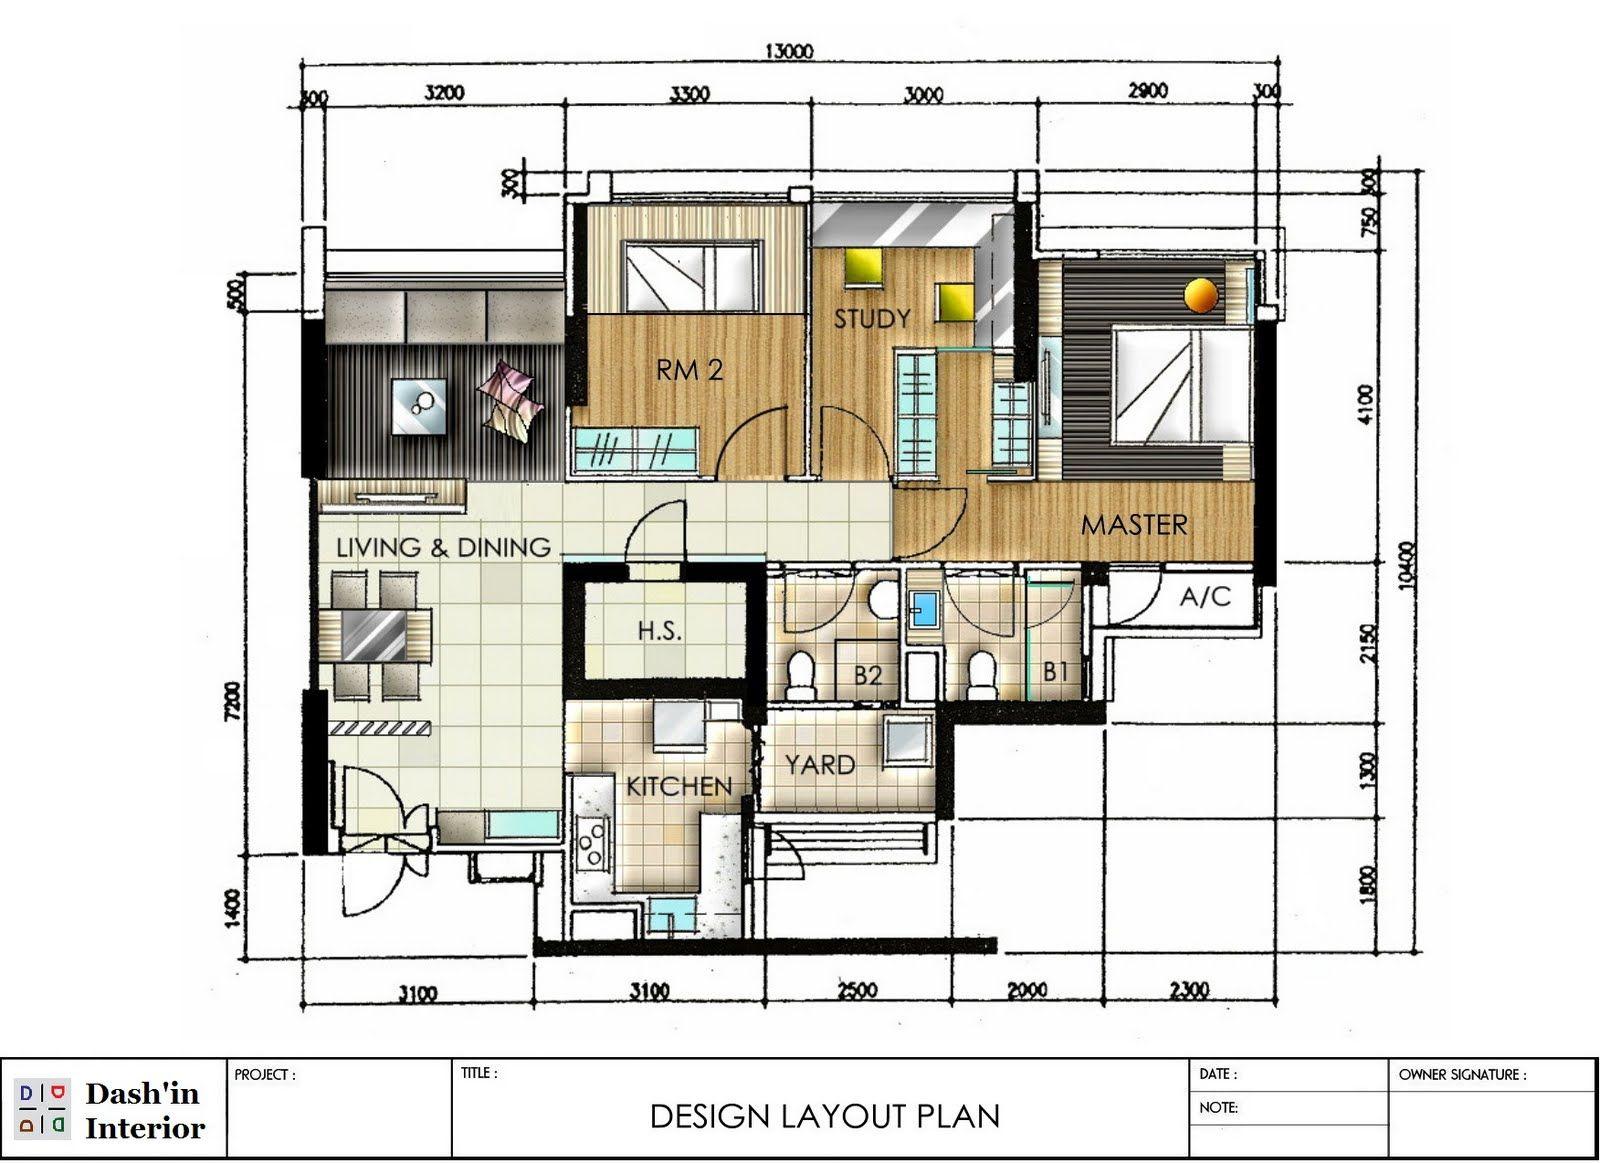 Dash Interior Hand Drawn Designs Floor Plan Layout That This Typical